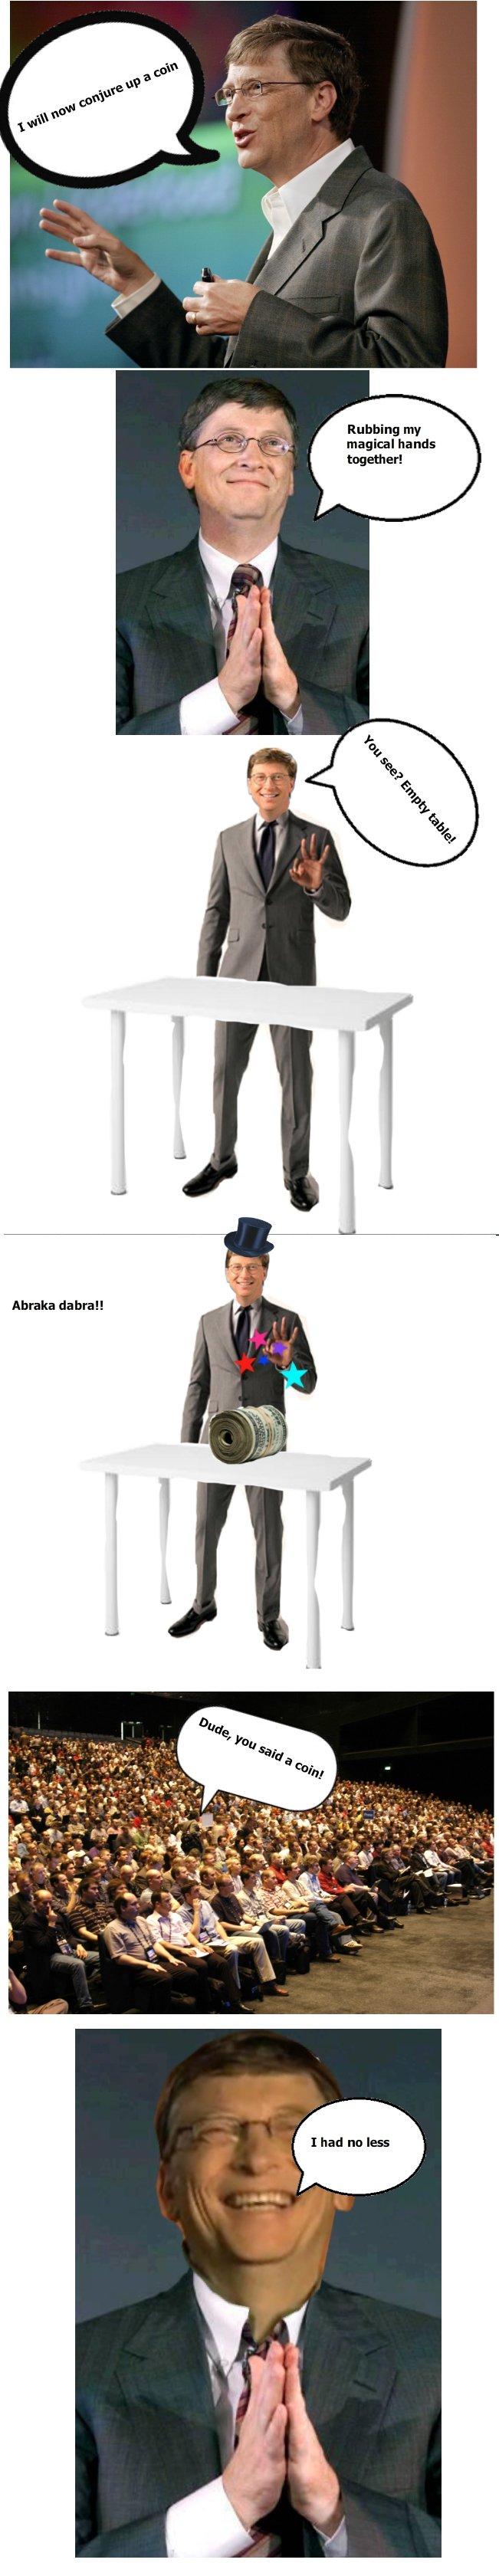 Bill Gates magical show!. 100% OC!. Rubbing my magical hands togethere. Abraca debra!!. LOLOLOL!!!